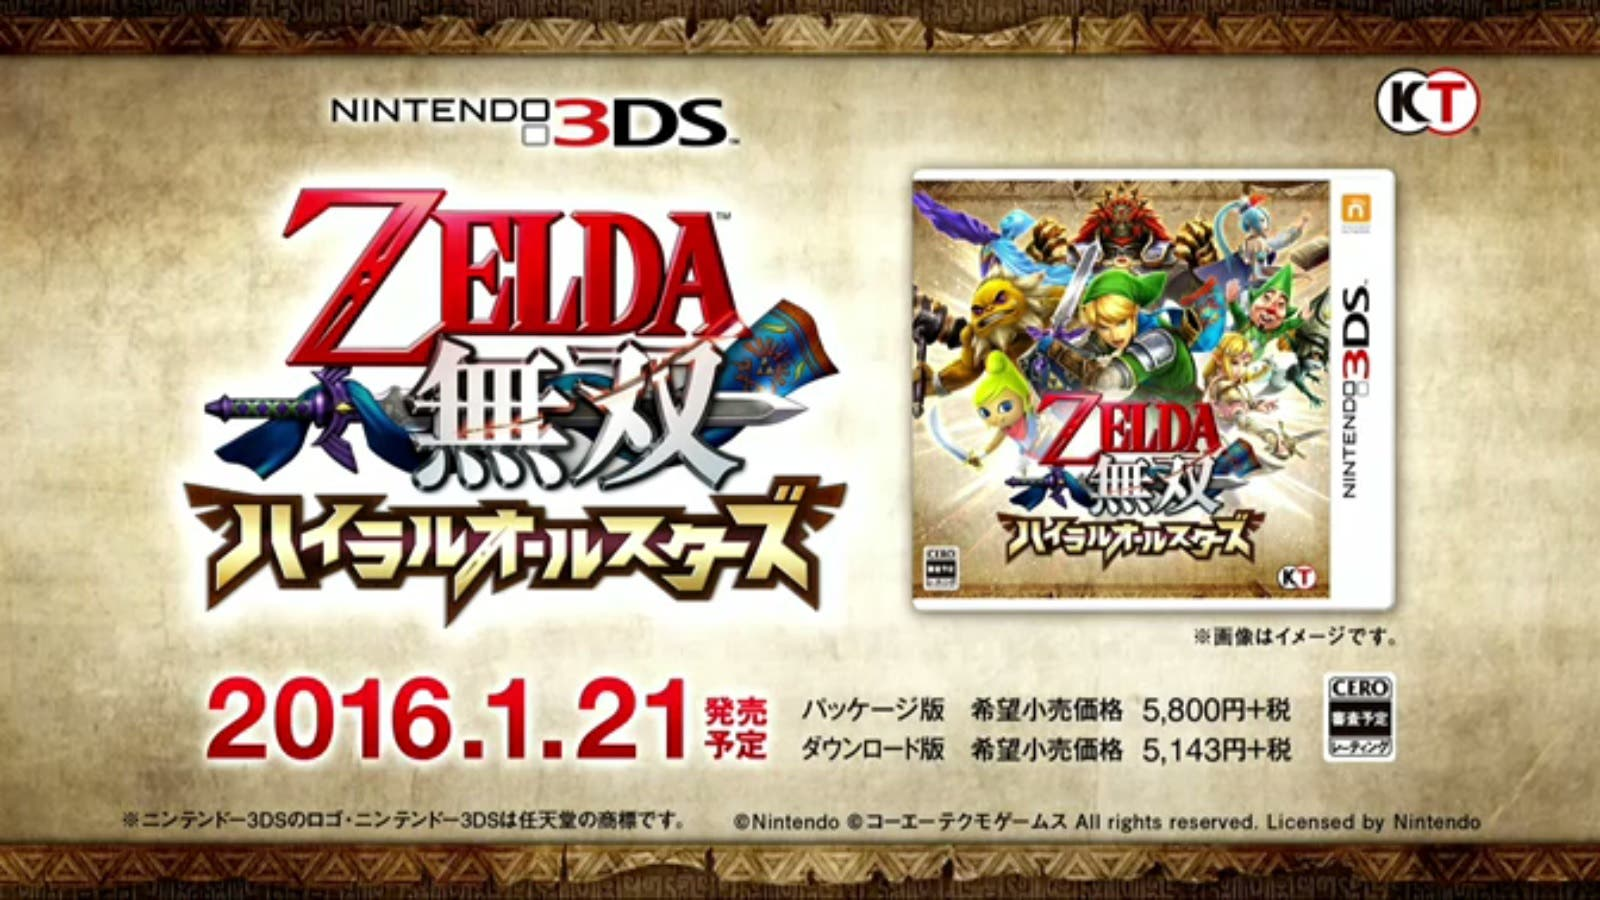 Hyrule warriors theme 3DS